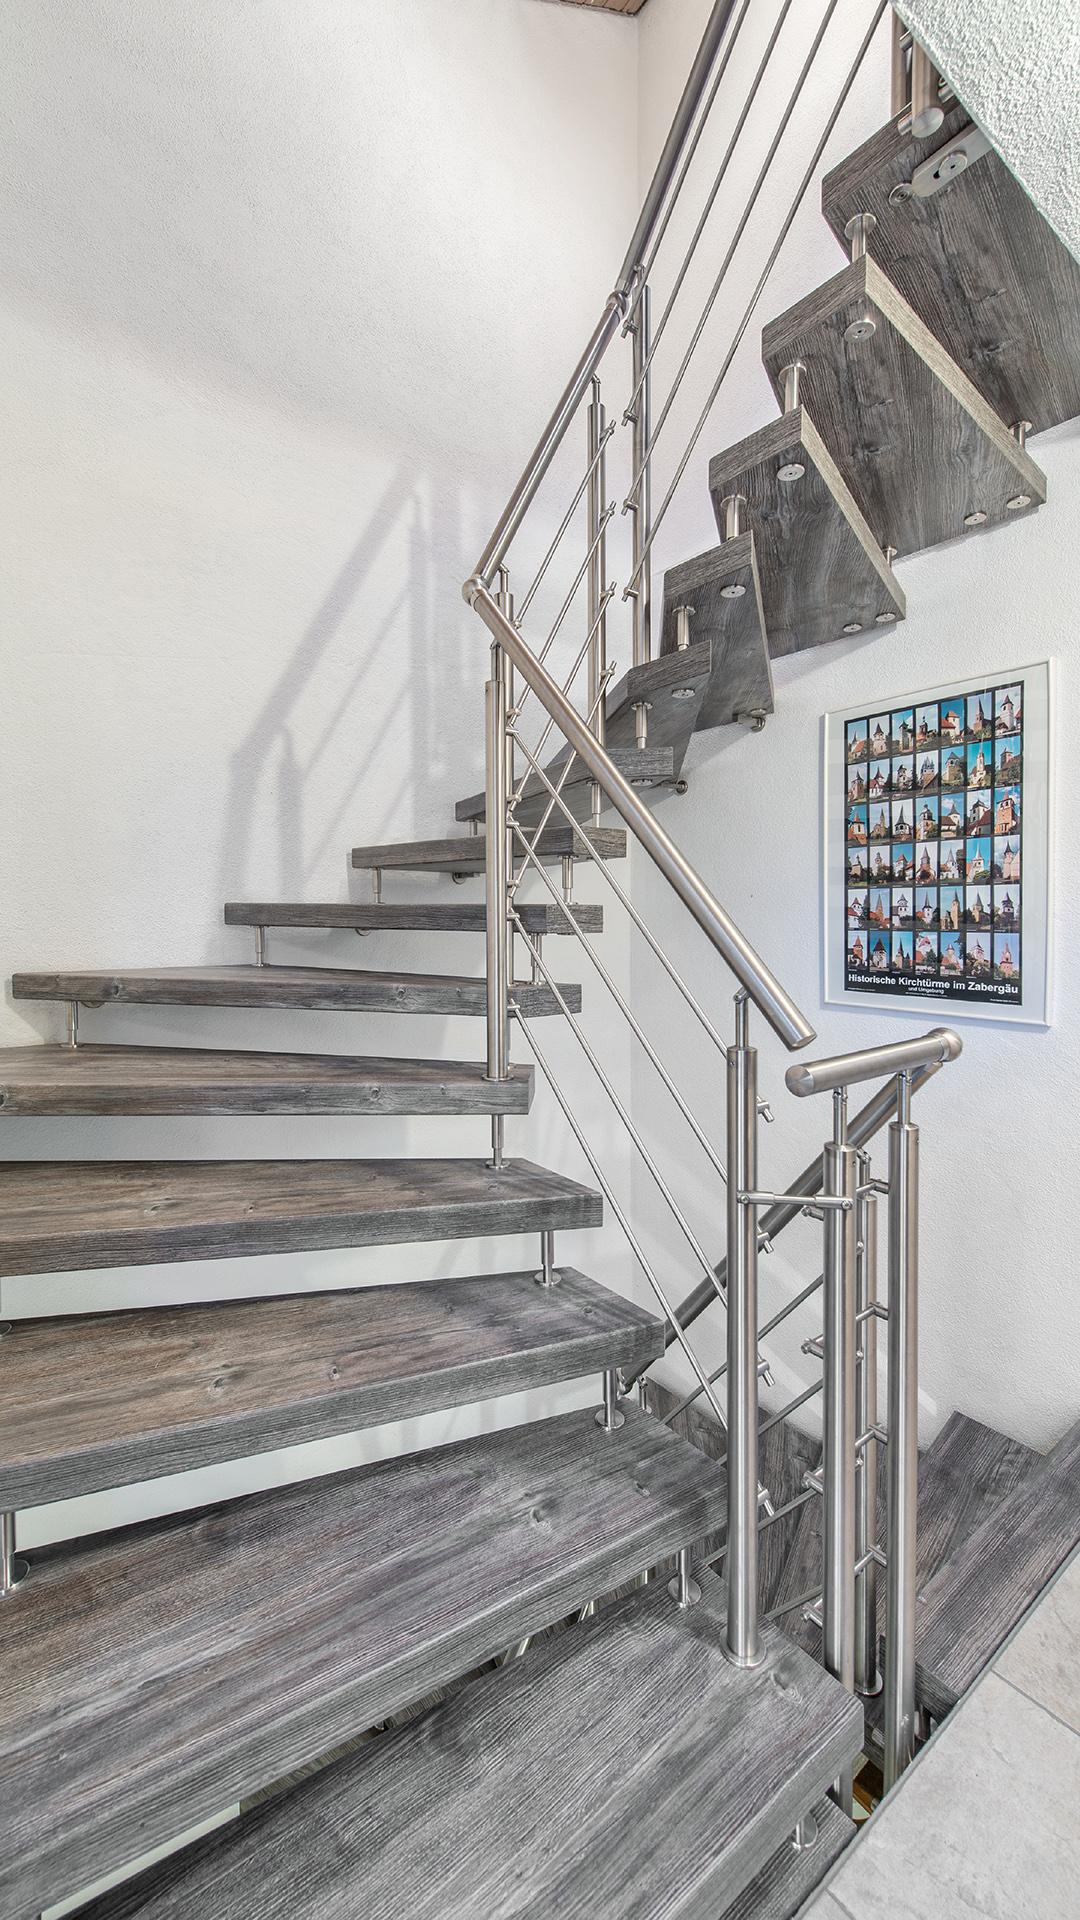 Galerien Treppen Kenngott Kenngott Treppen Bauen Com